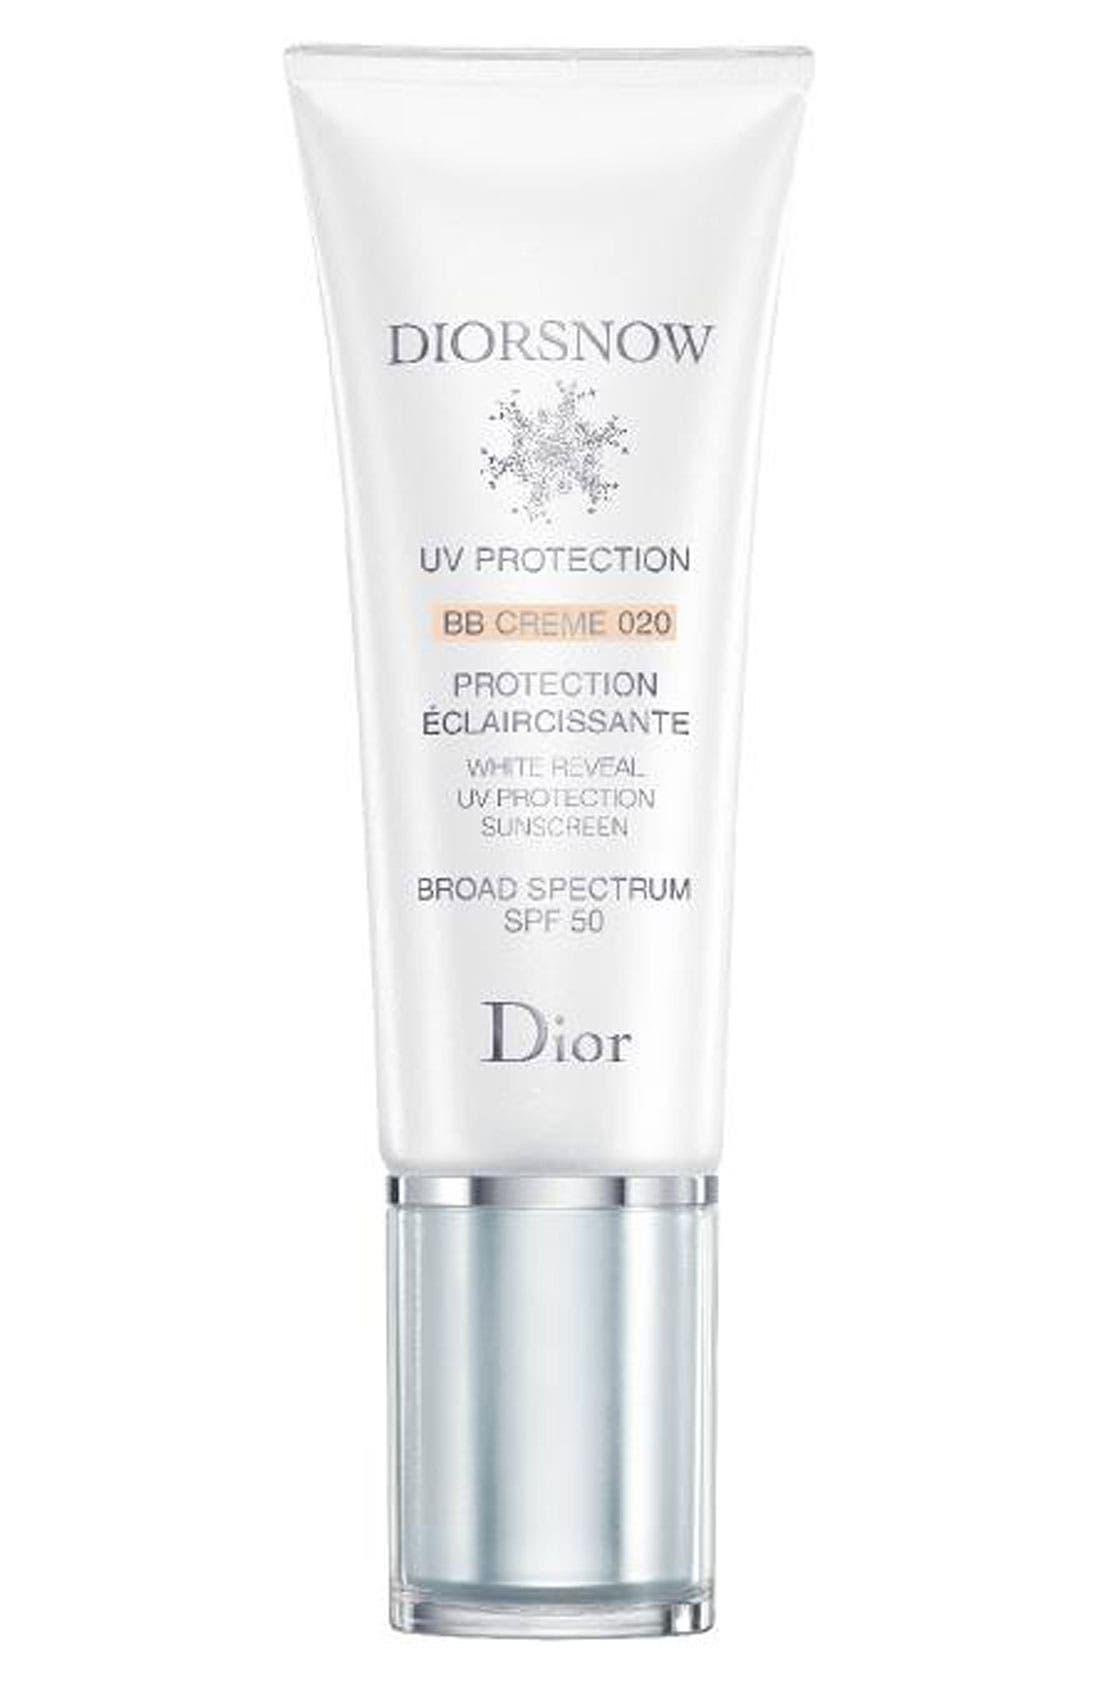 'Diorsnow' BB Creme Sunscreen Broad Spectrum SPF 50,                             Main thumbnail 1, color,                             250